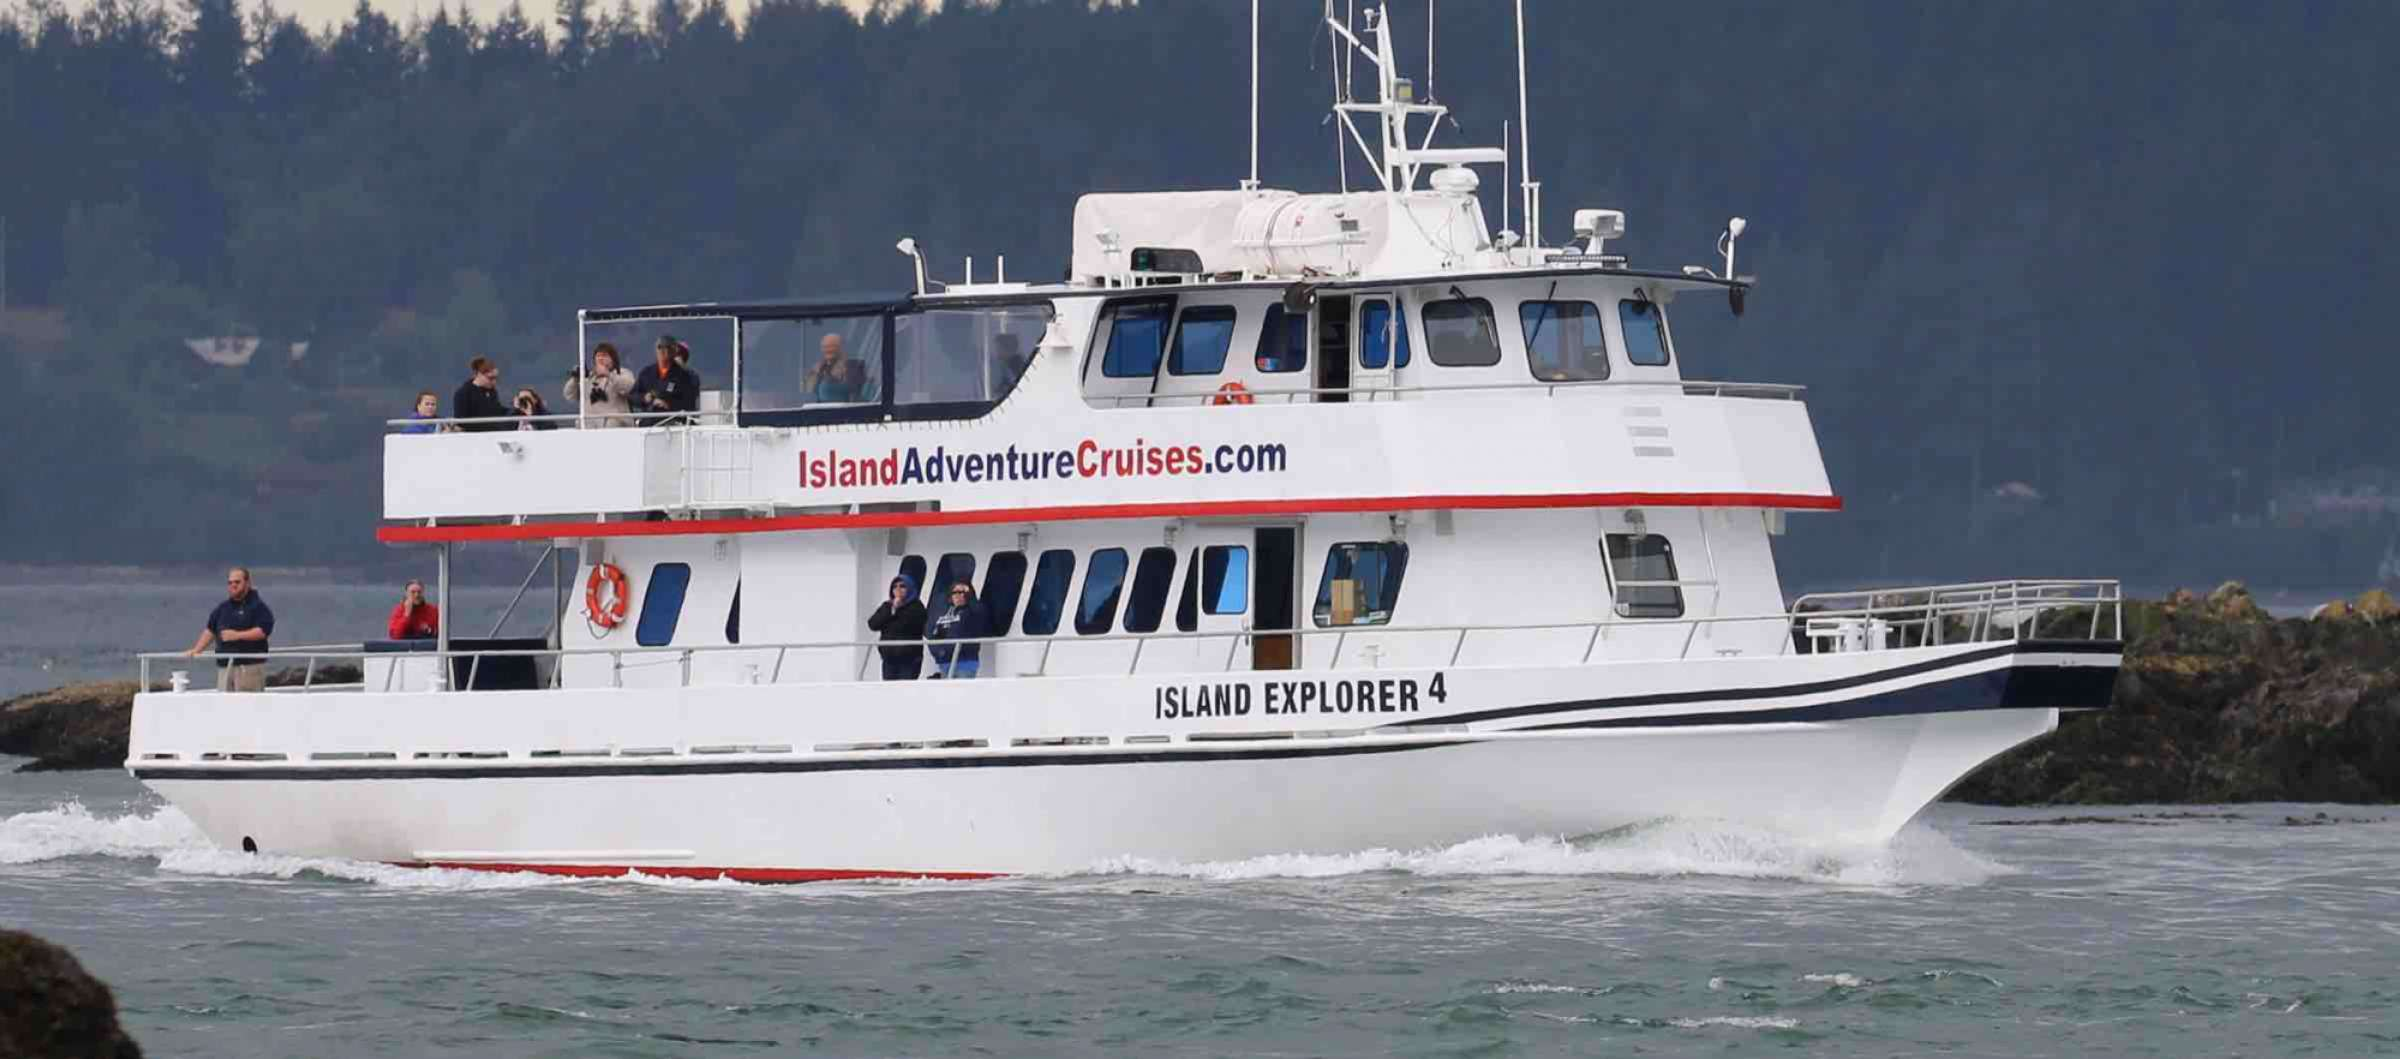 Seattle Whale Watching Island Explorer 4